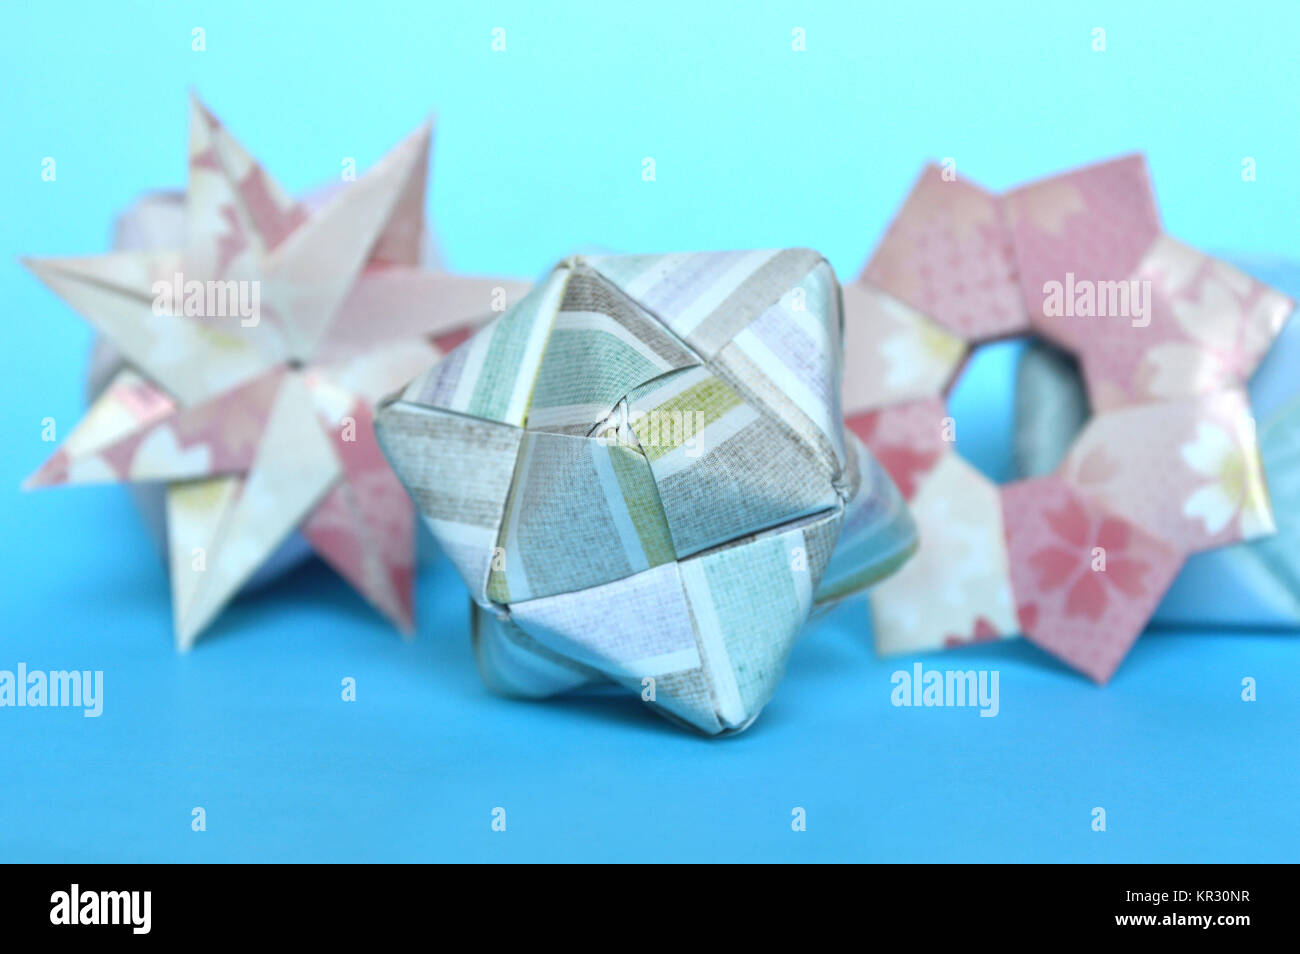 Origami Ball Stock Photos & Origami Ball Stock Images - Alamy - photo#40